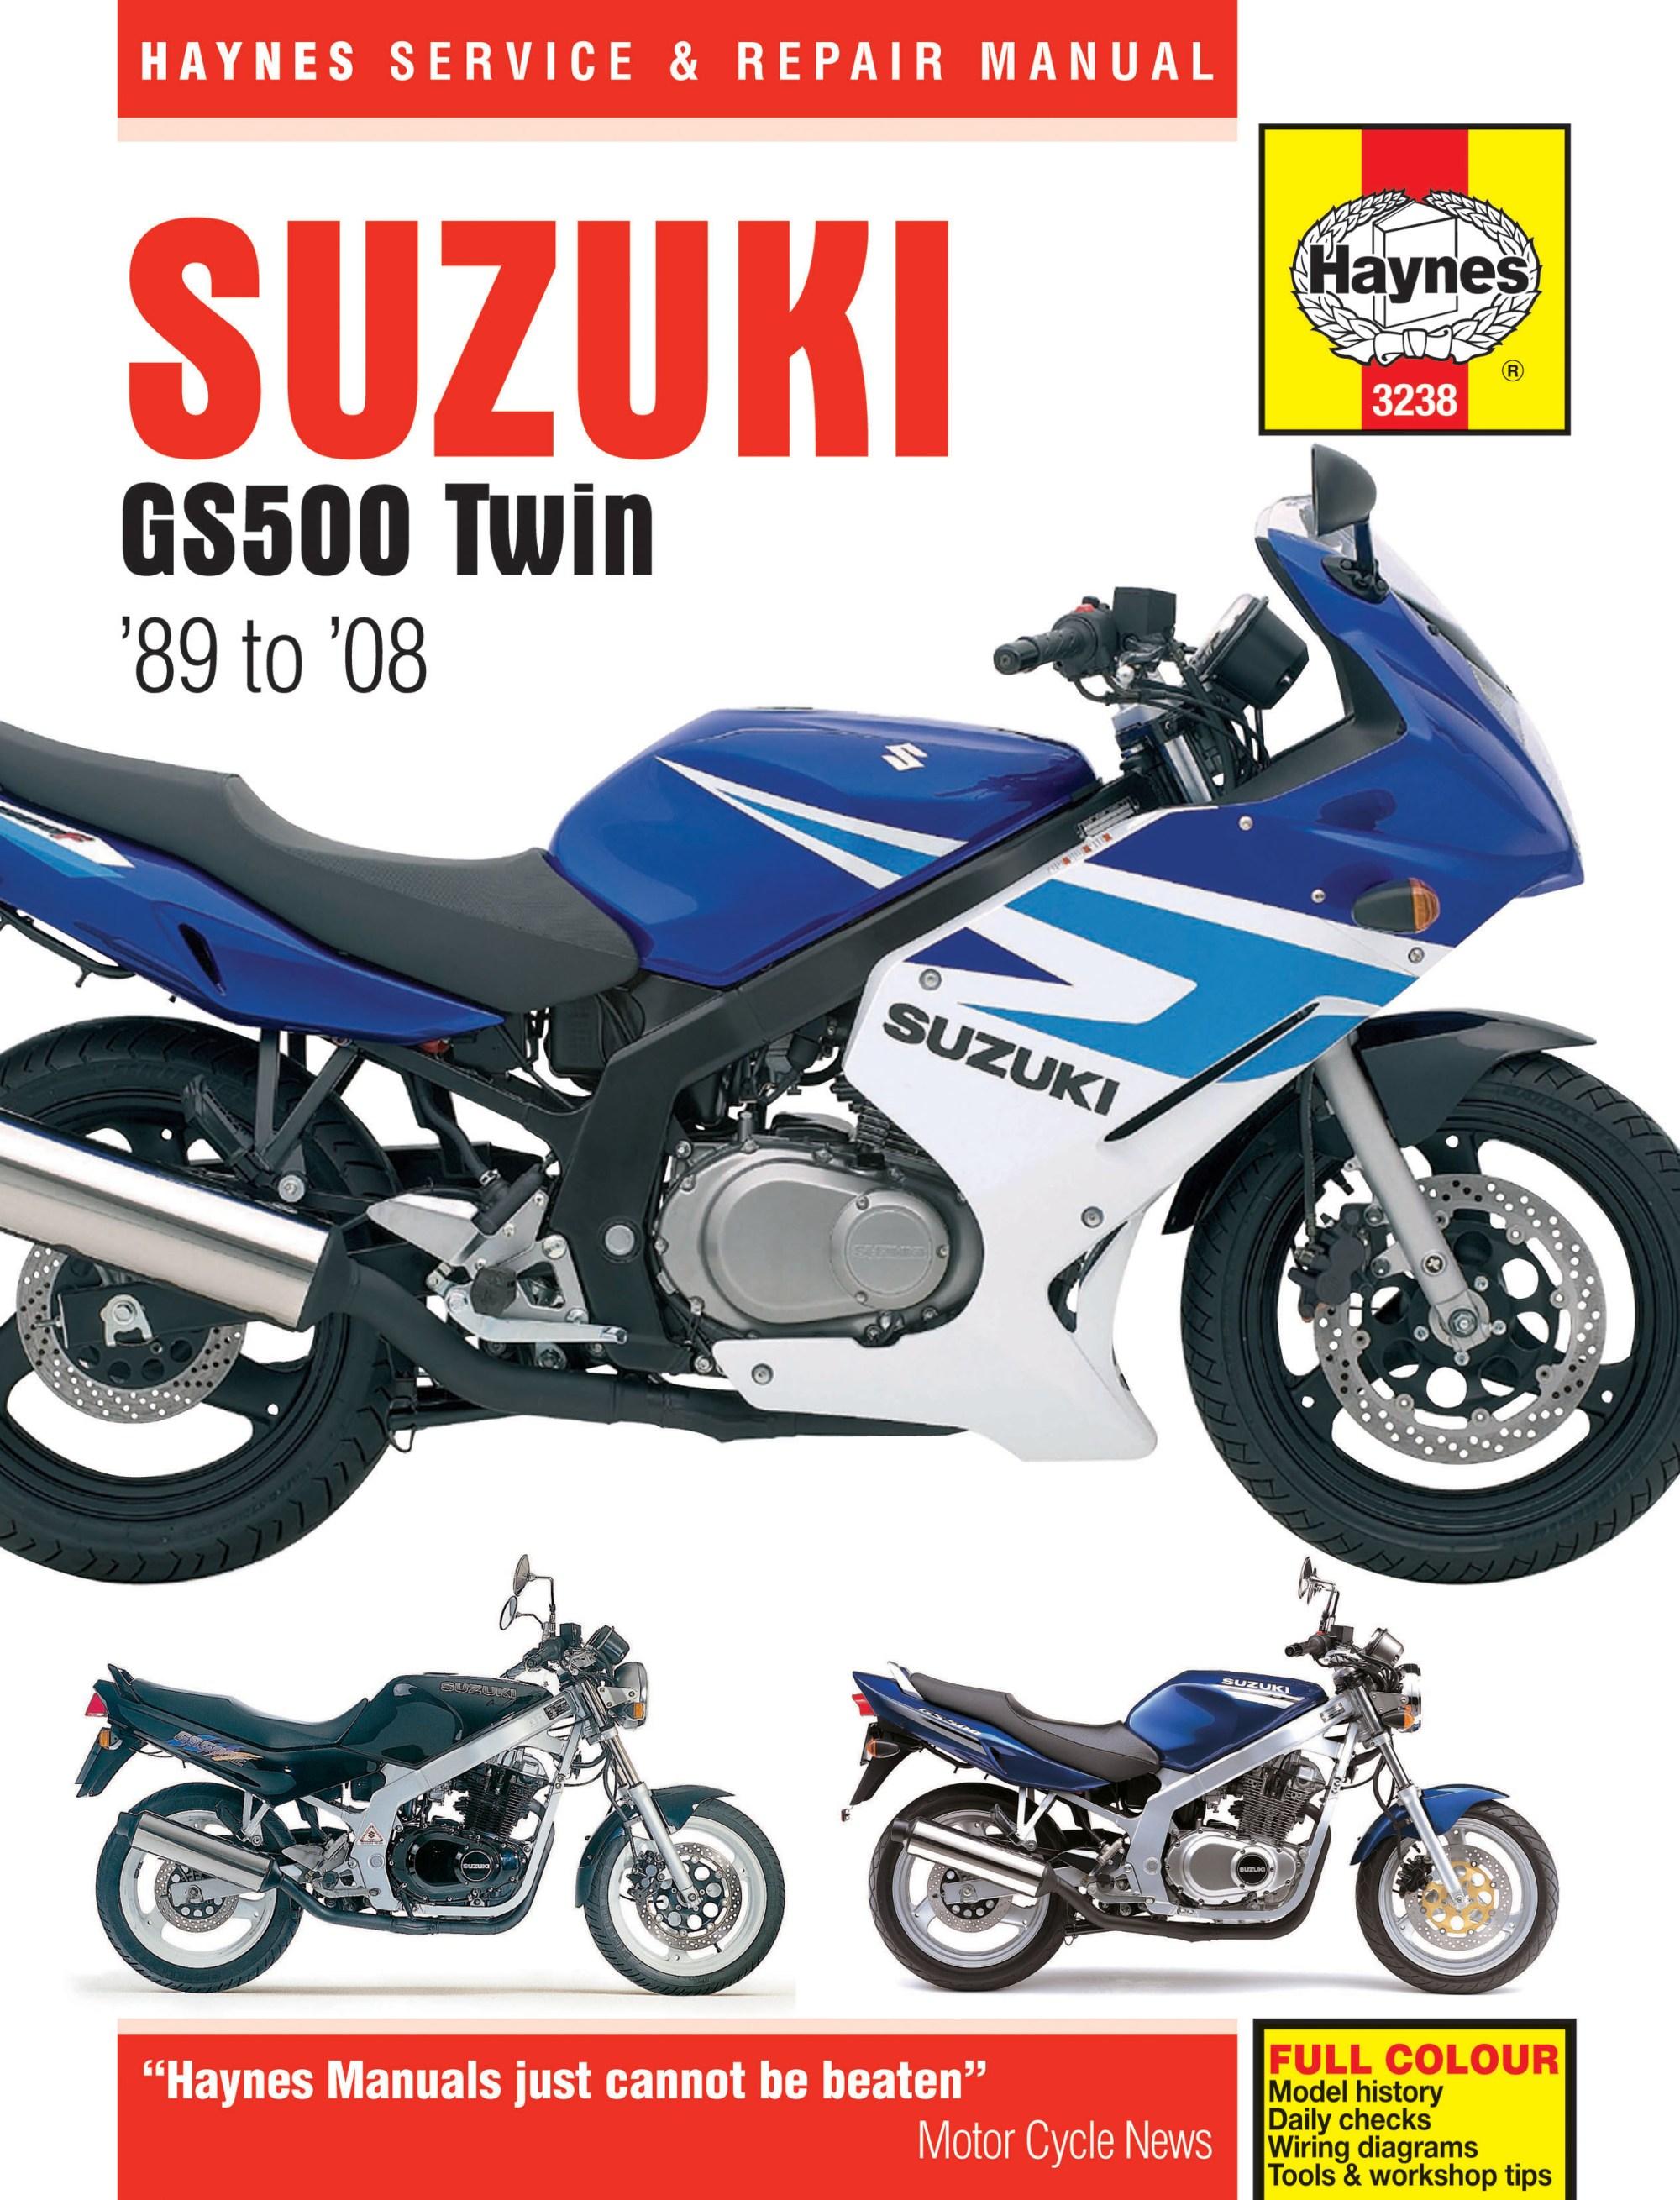 hight resolution of suzuki gs500 twin 89 08 haynes verkstadhanbokhaynes verkstadhanbok suzuki gs500f wiring diagram